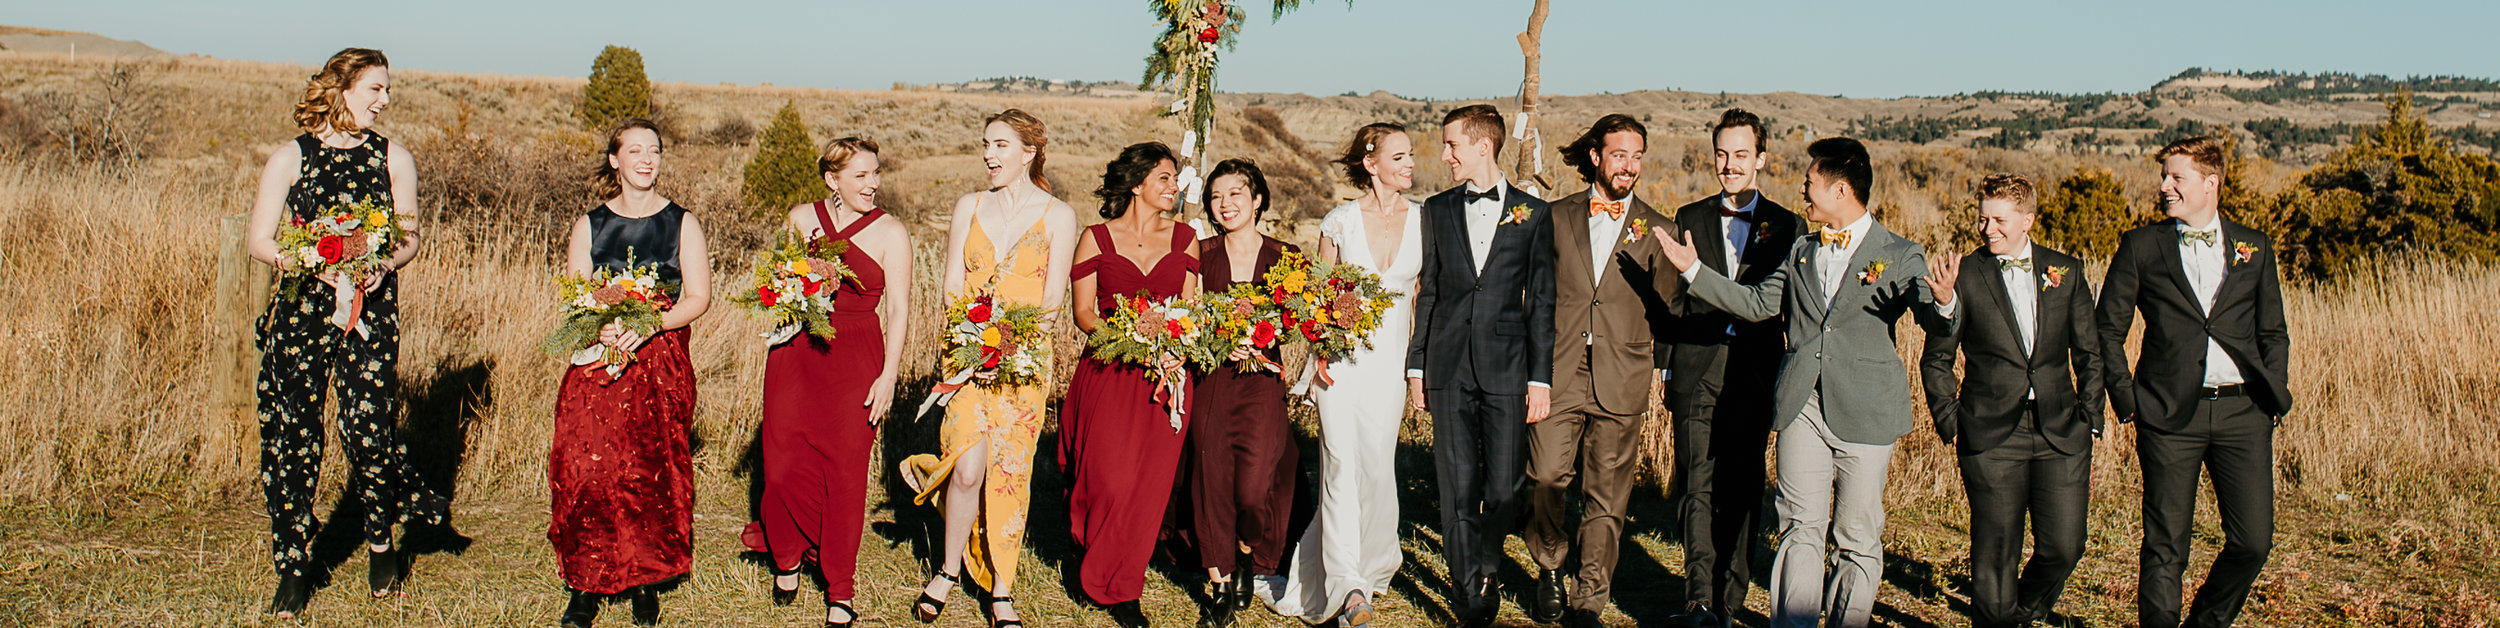 0769Fall Wedding_Maroon Wedding_Billings Wedding Photographer_Emma + Dan_October 20, 2018-3777.jpg